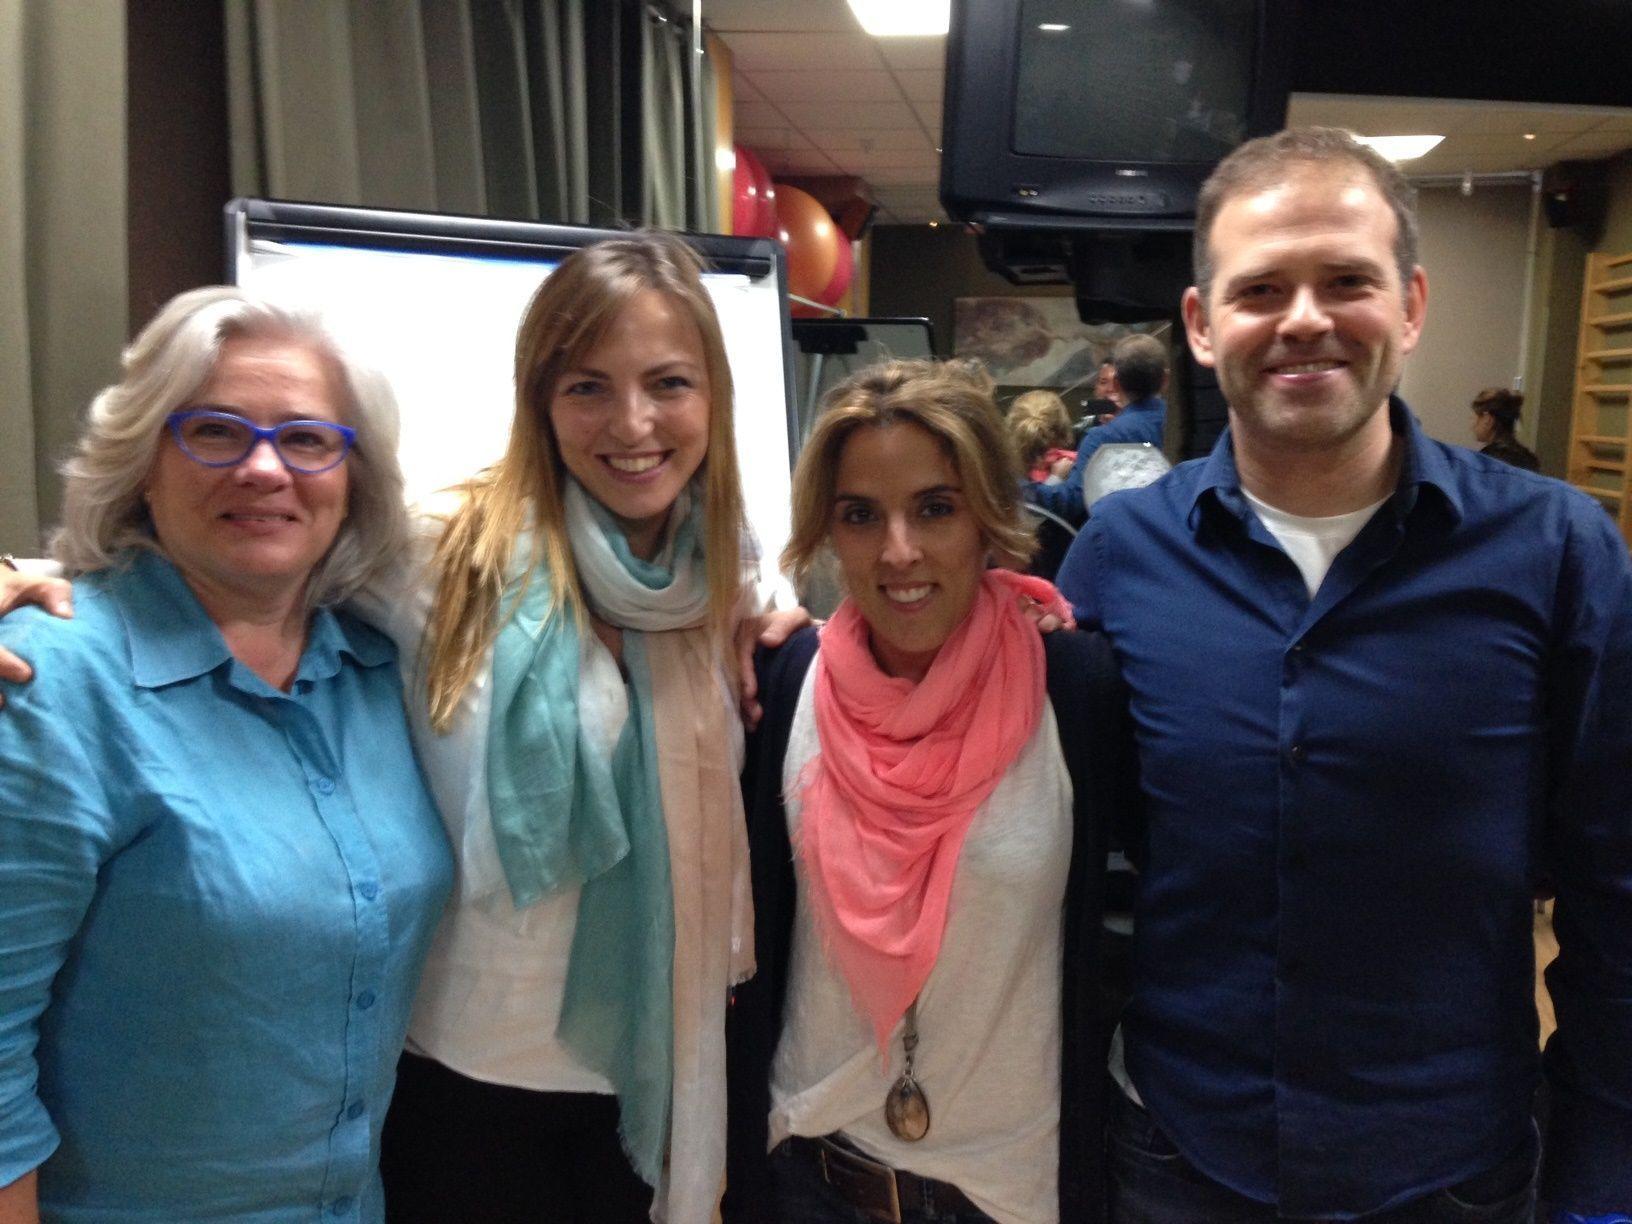 MªAngeles Jové, Lucía Galán, Andrea Zambrano y Jaume Roset